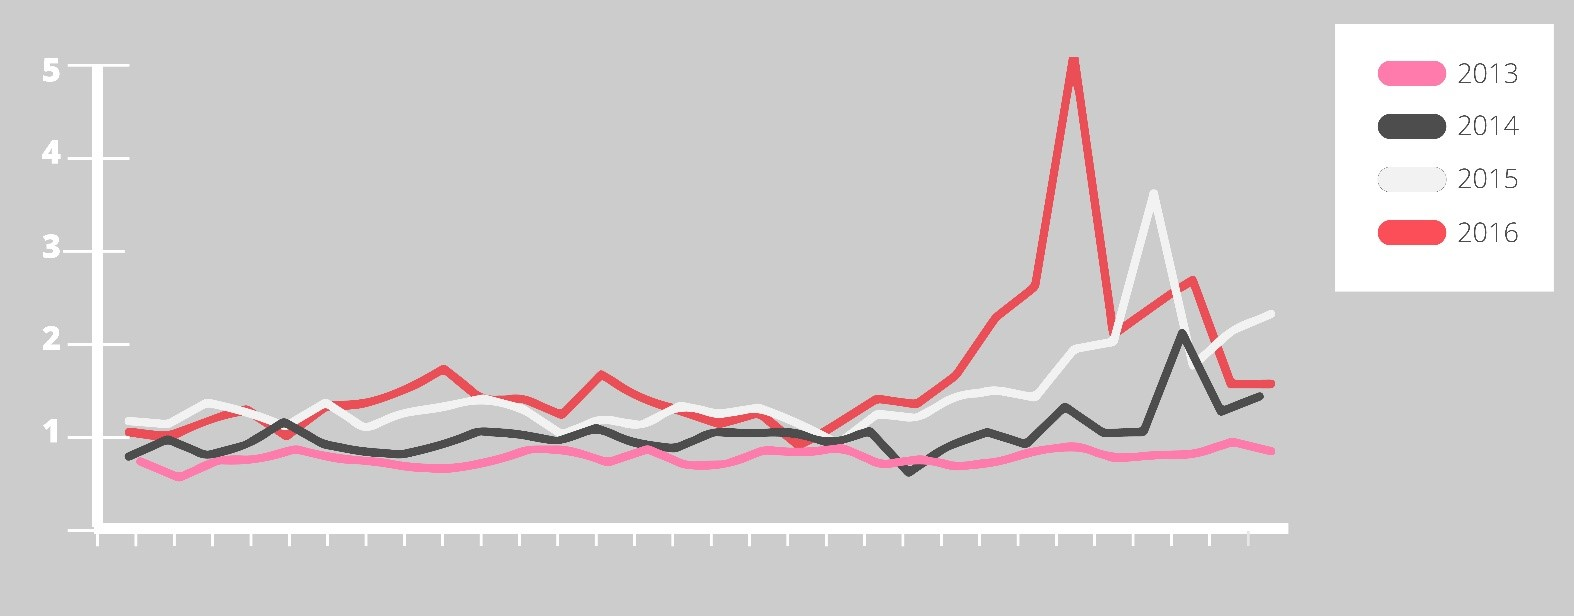 Webgainsplatform_November